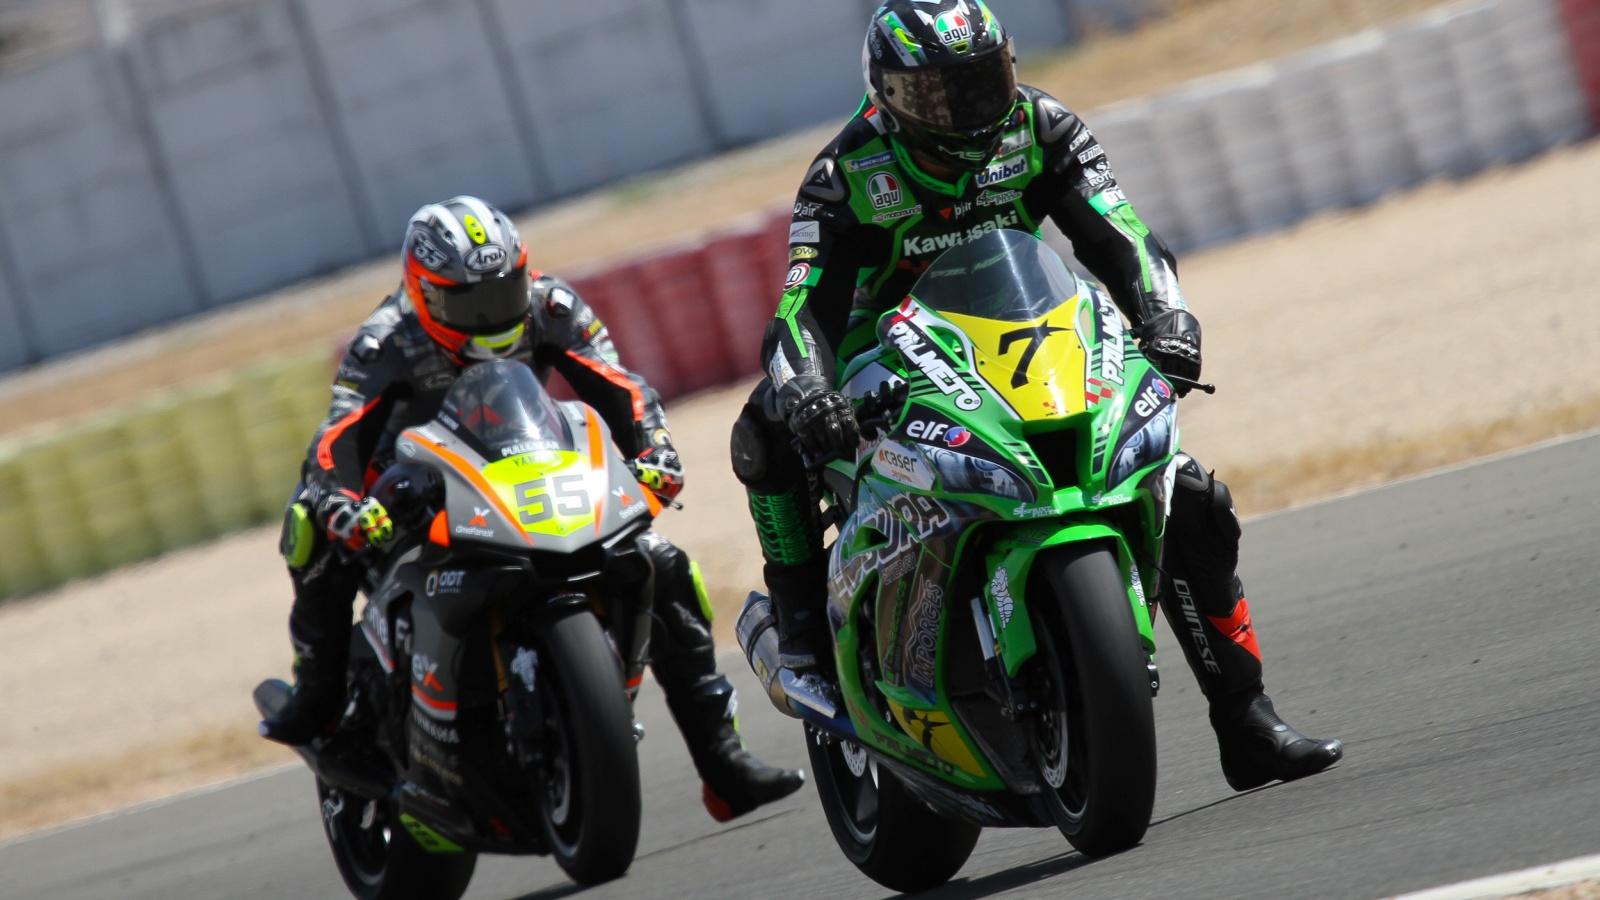 ESBK Albacete: Maxi Scheib vence en Superbike y Héctor Garzó se impone en Supersport